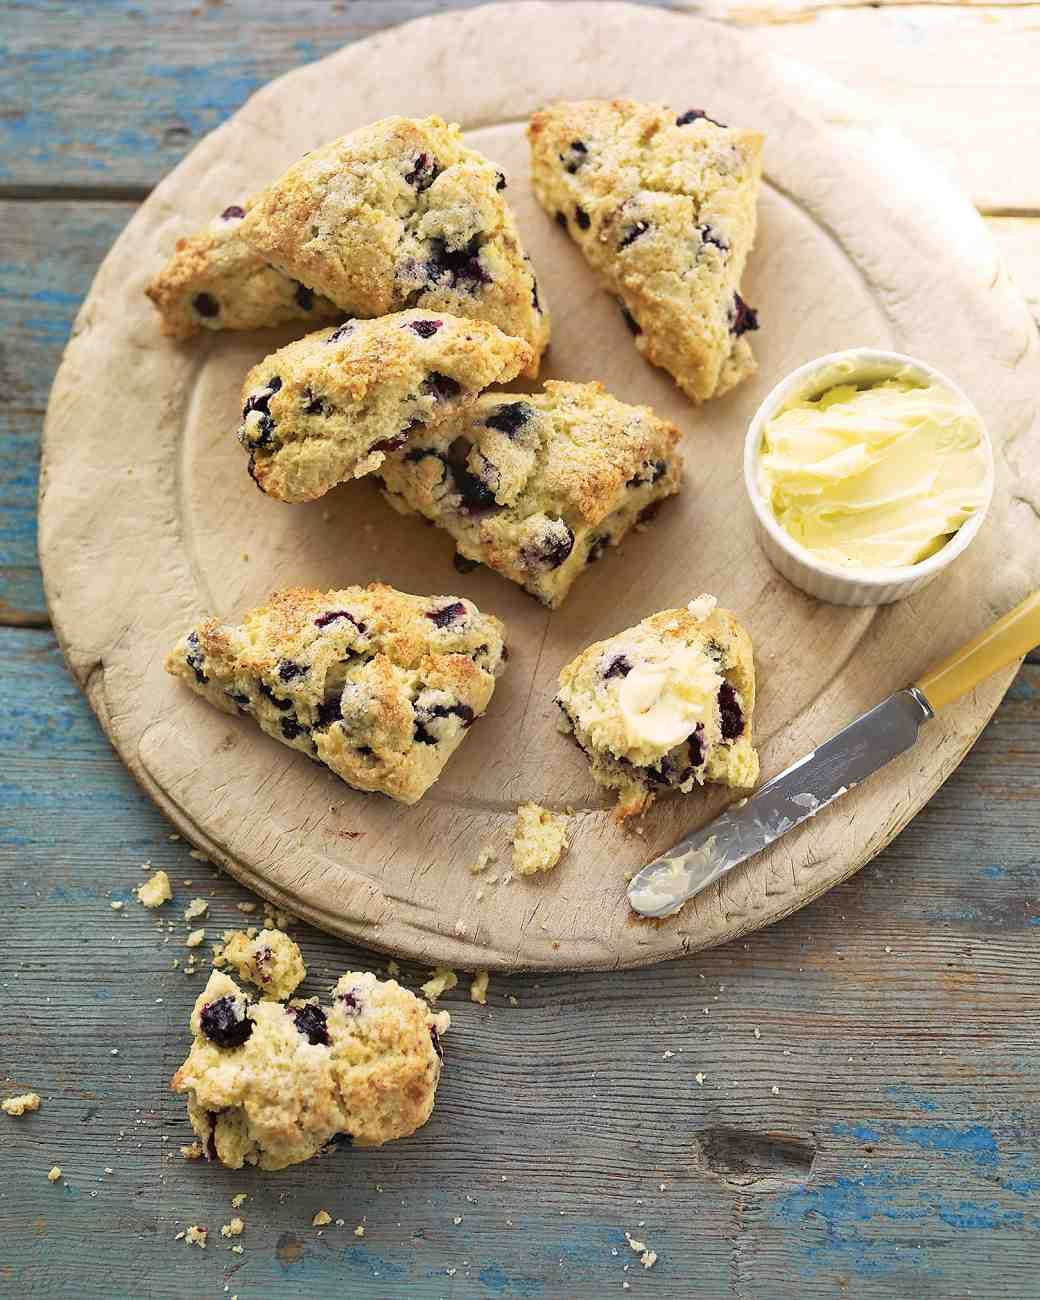 Blueberry Buttermilk Scones Recipe Scone Recipe Buttermilk Scone Recipe Recipes